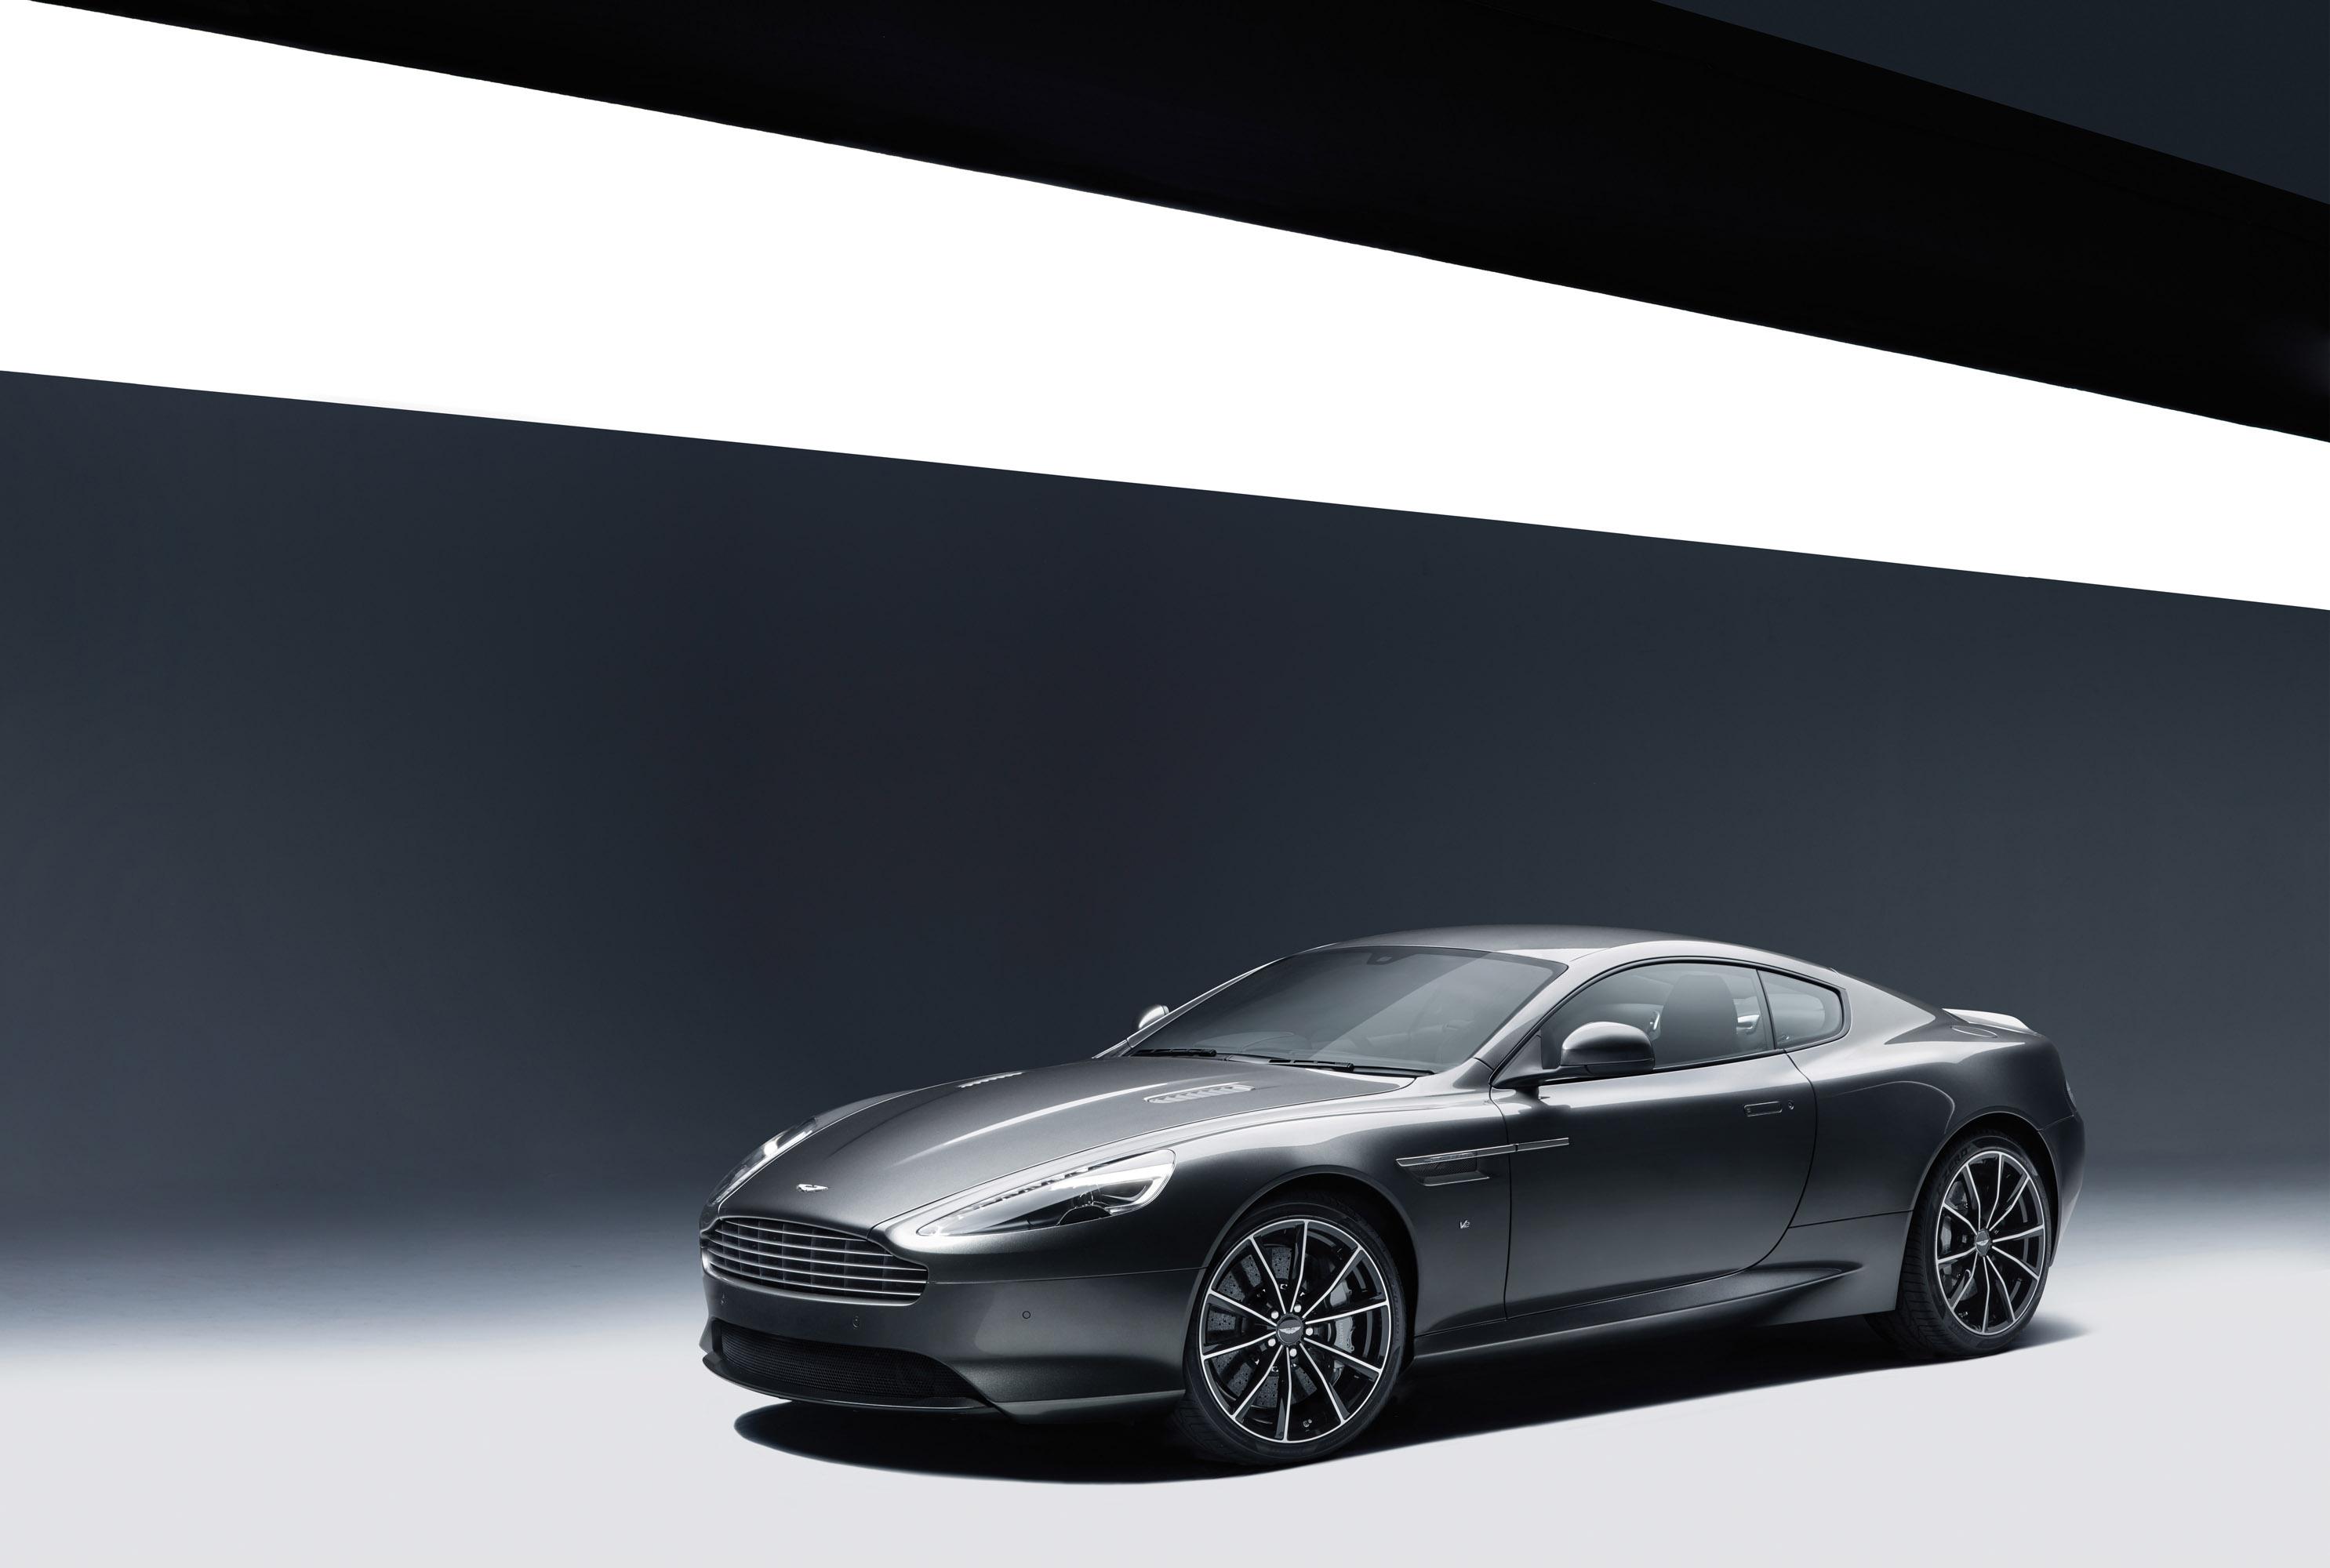 Aston Martin DB9 GT photo #2